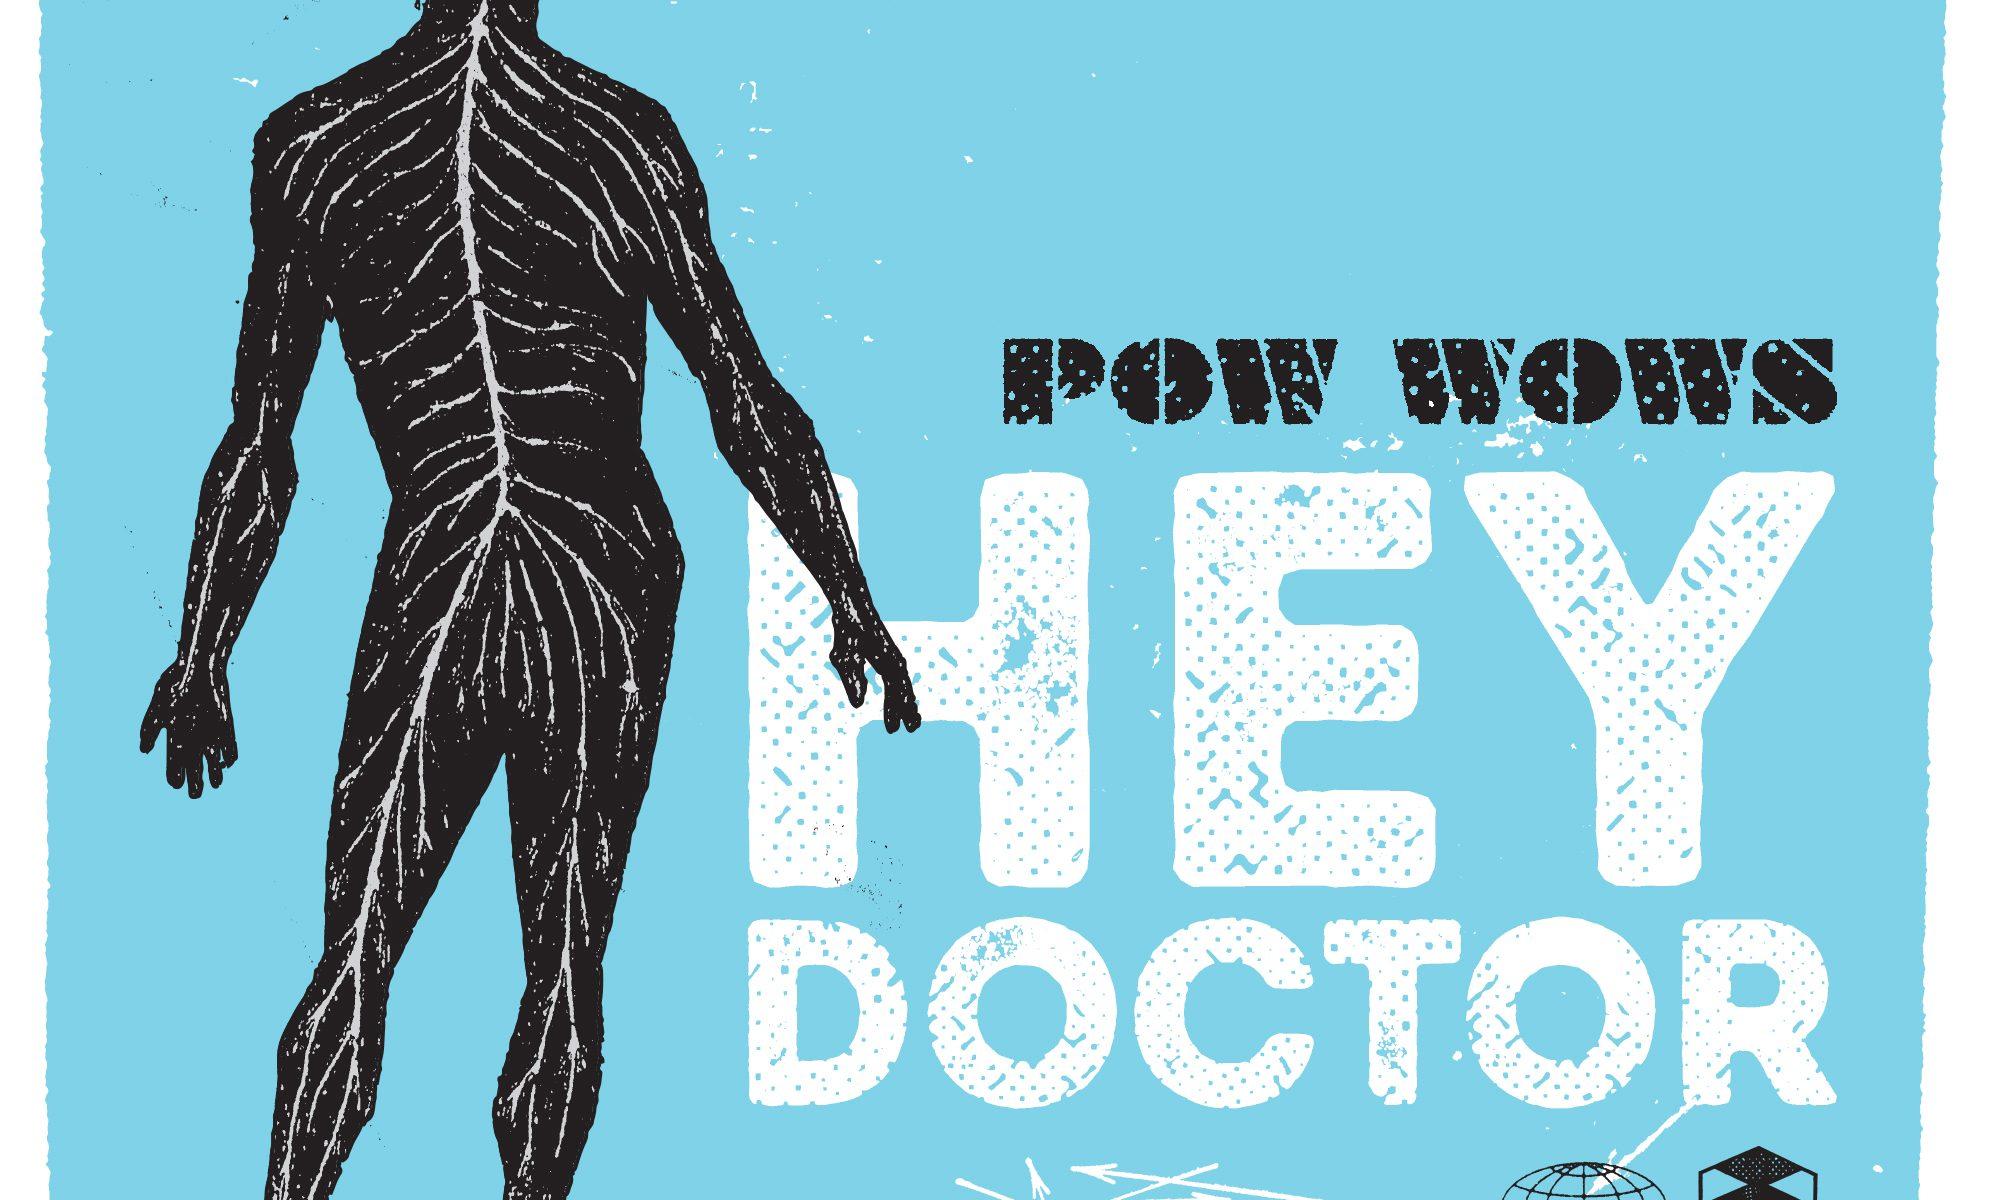 Pow Wows | Hey Doctor | 3hive.com